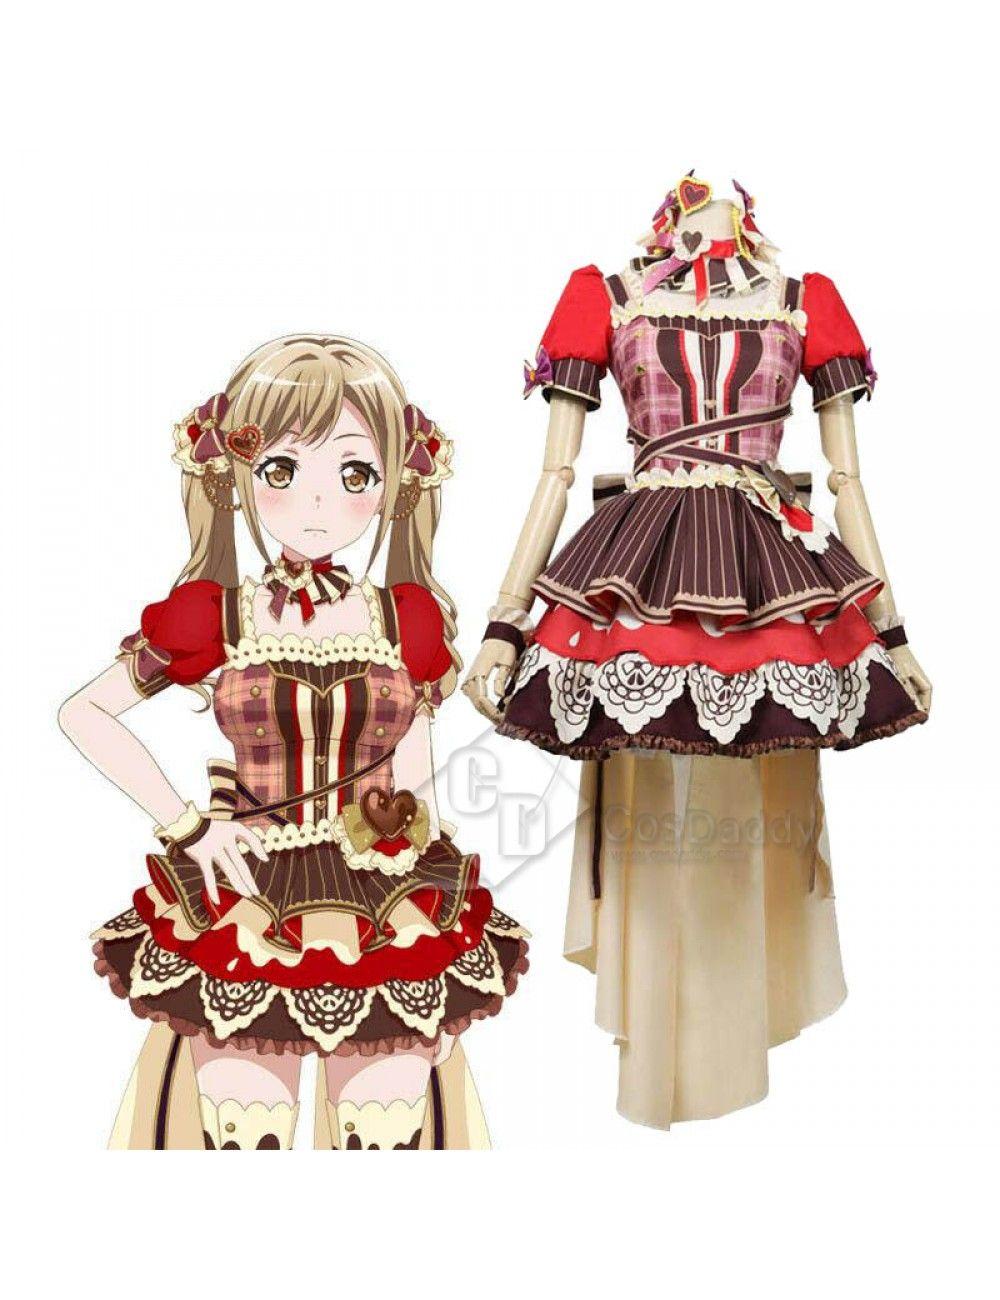 Bangdream Dustabata Happy Valentine Ichigaya Arisa Cosplay Costume Cosplay Outfits Cosplay Costumes Anime Outfits